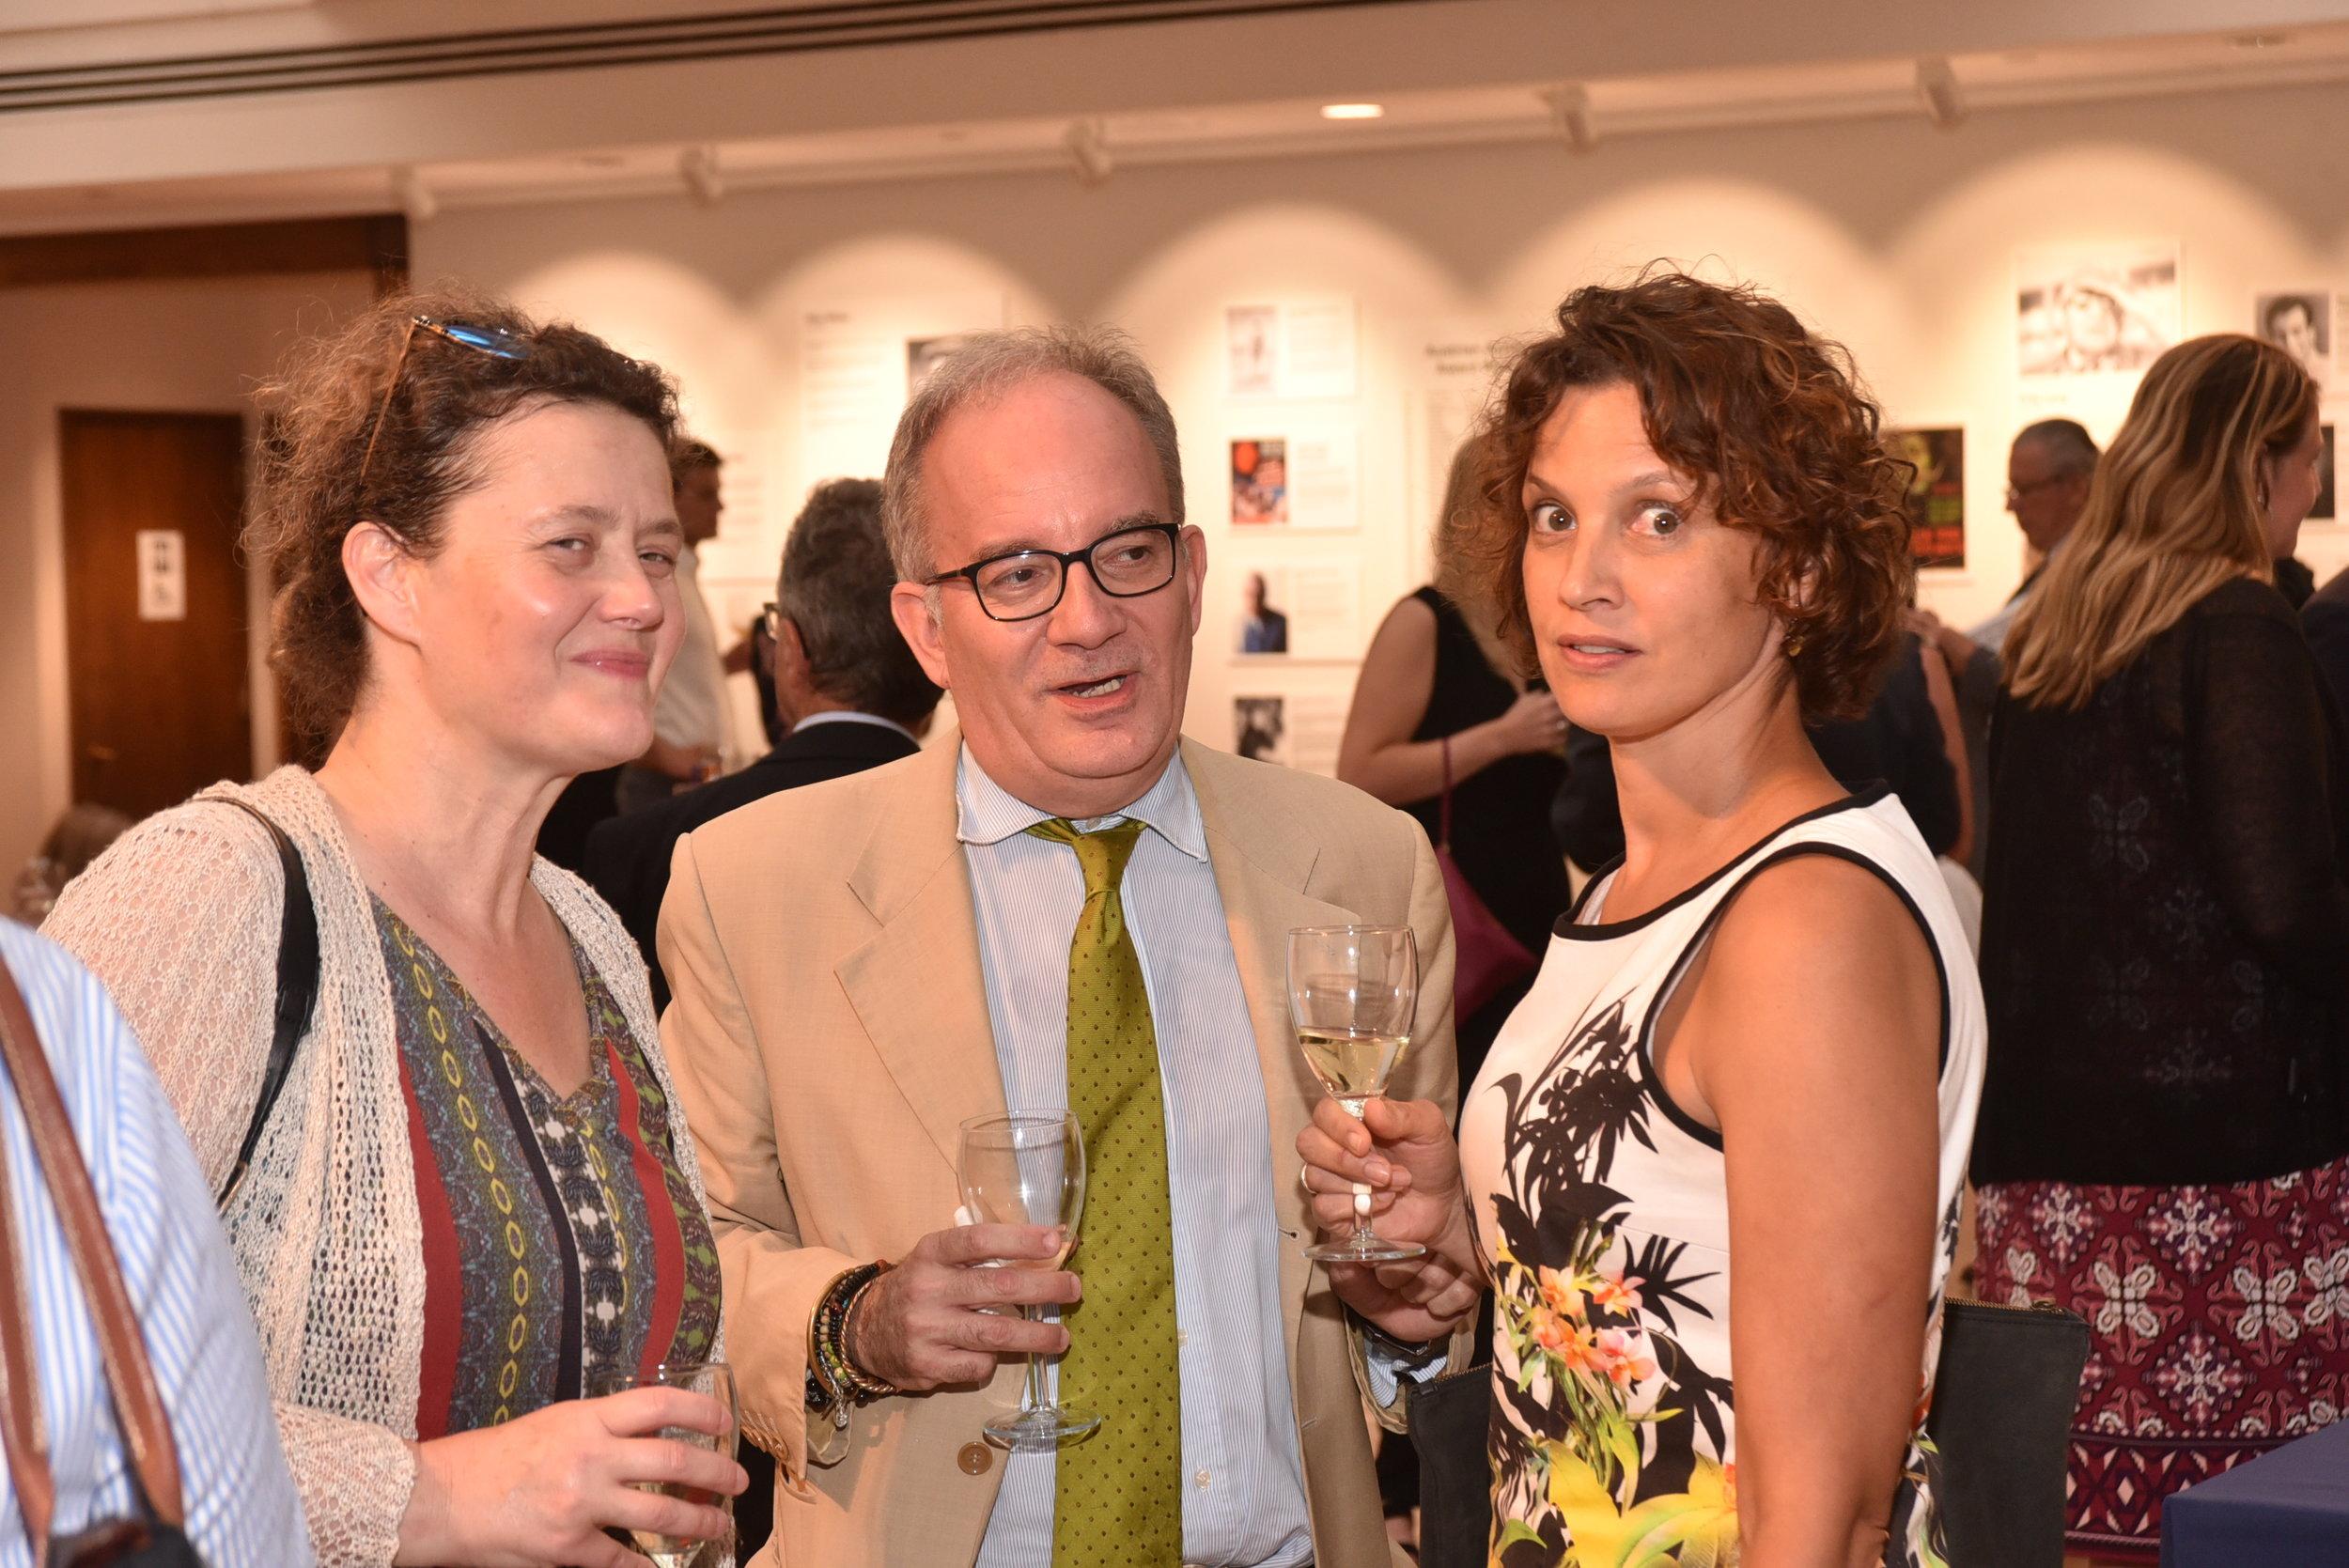 Eva Schöfer (right), Director of the Austrian Cultural Forum Washington, with guests.   Photo: Peter Alunans